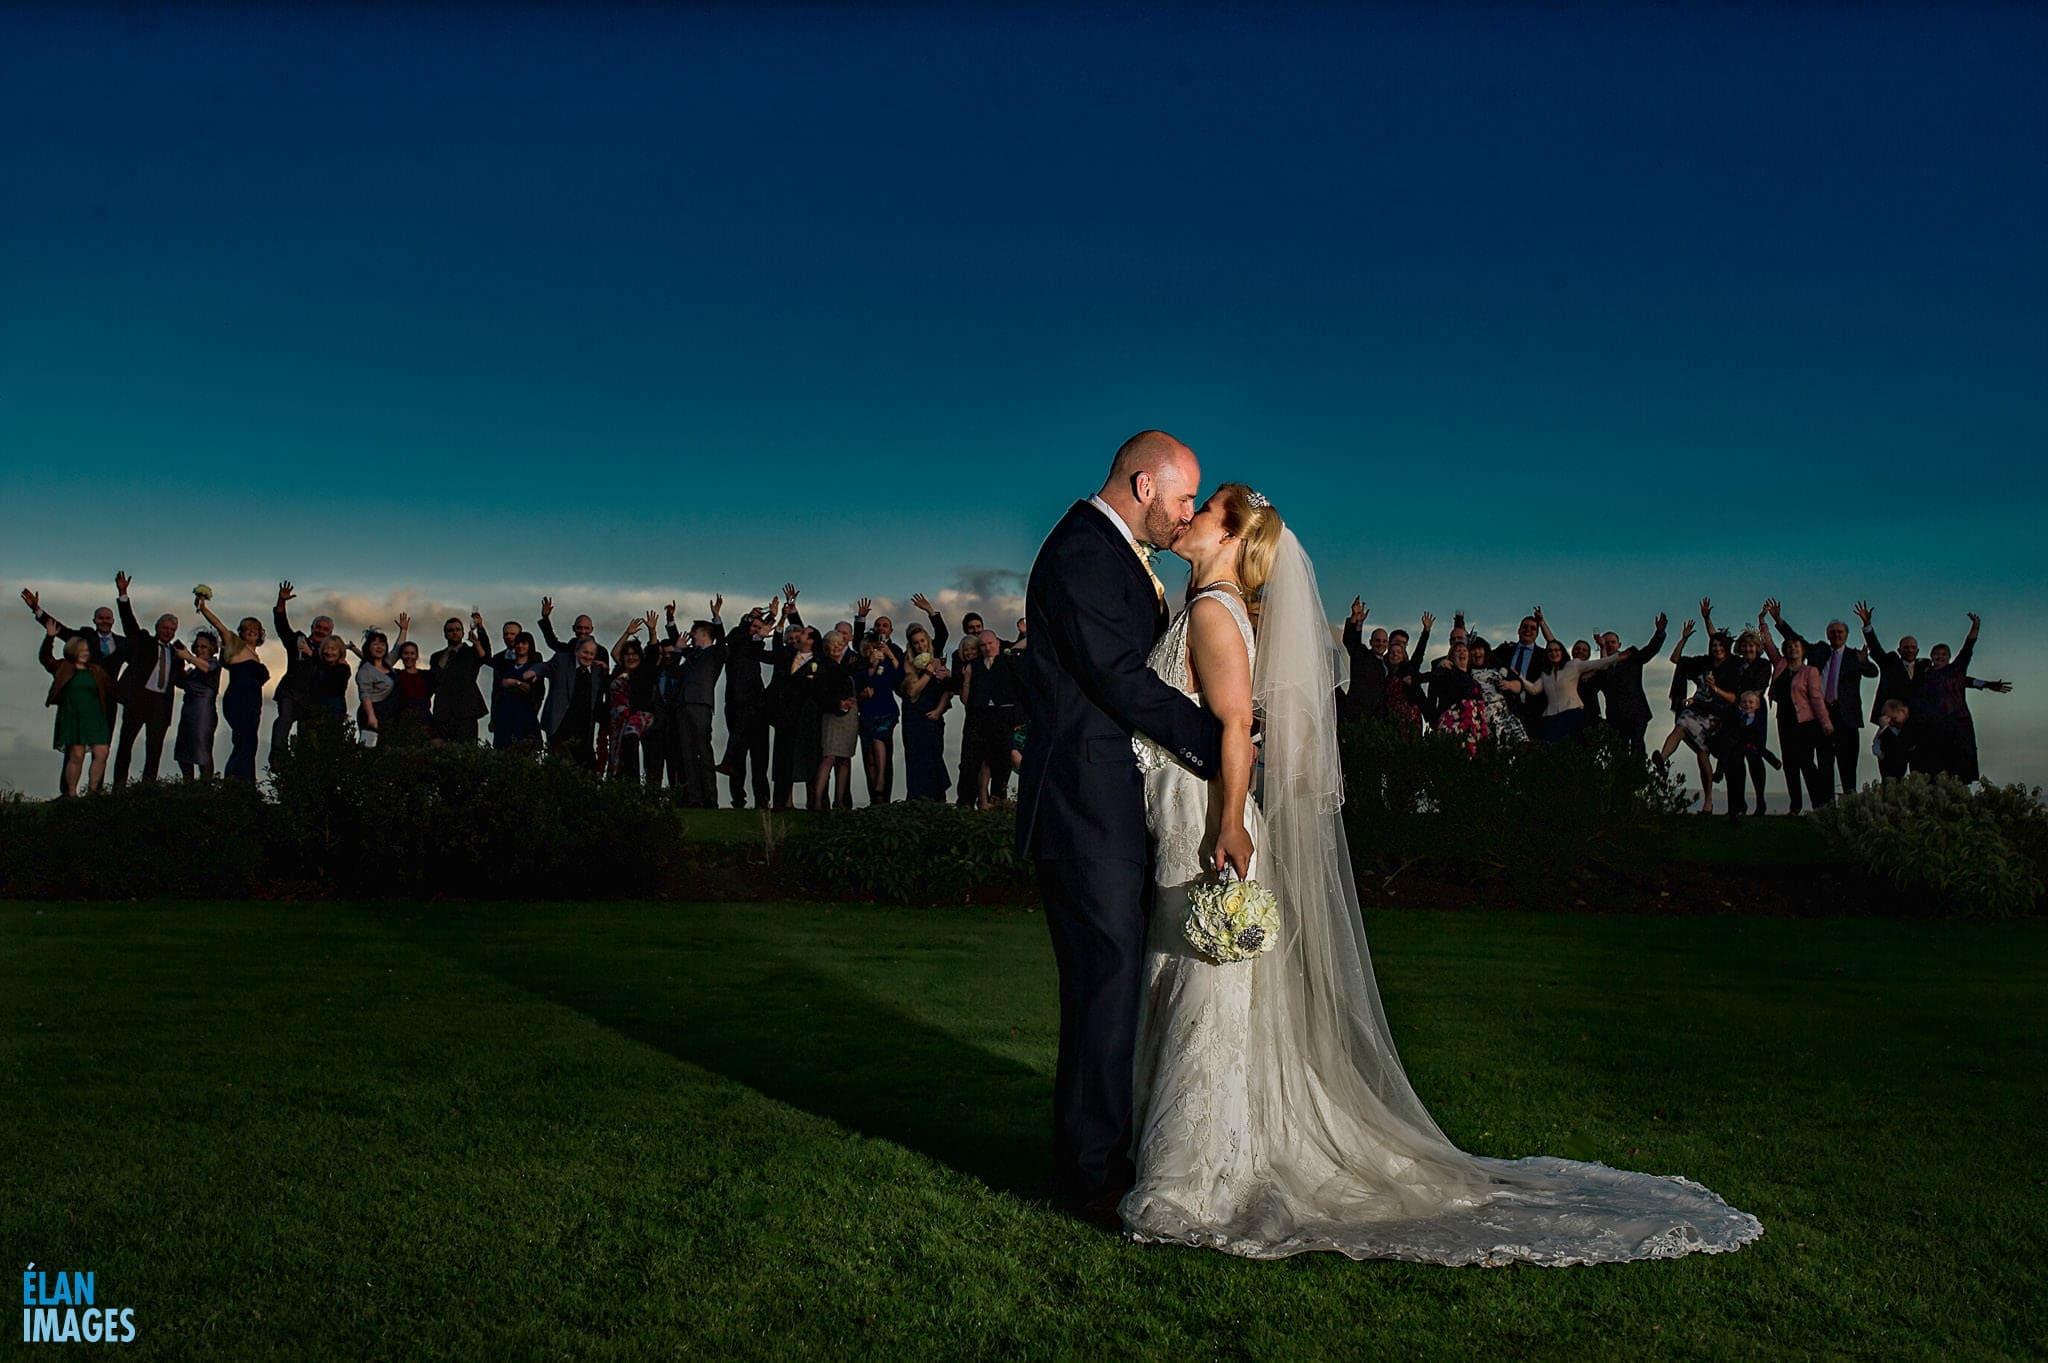 Wedding at leigh park hotel -079